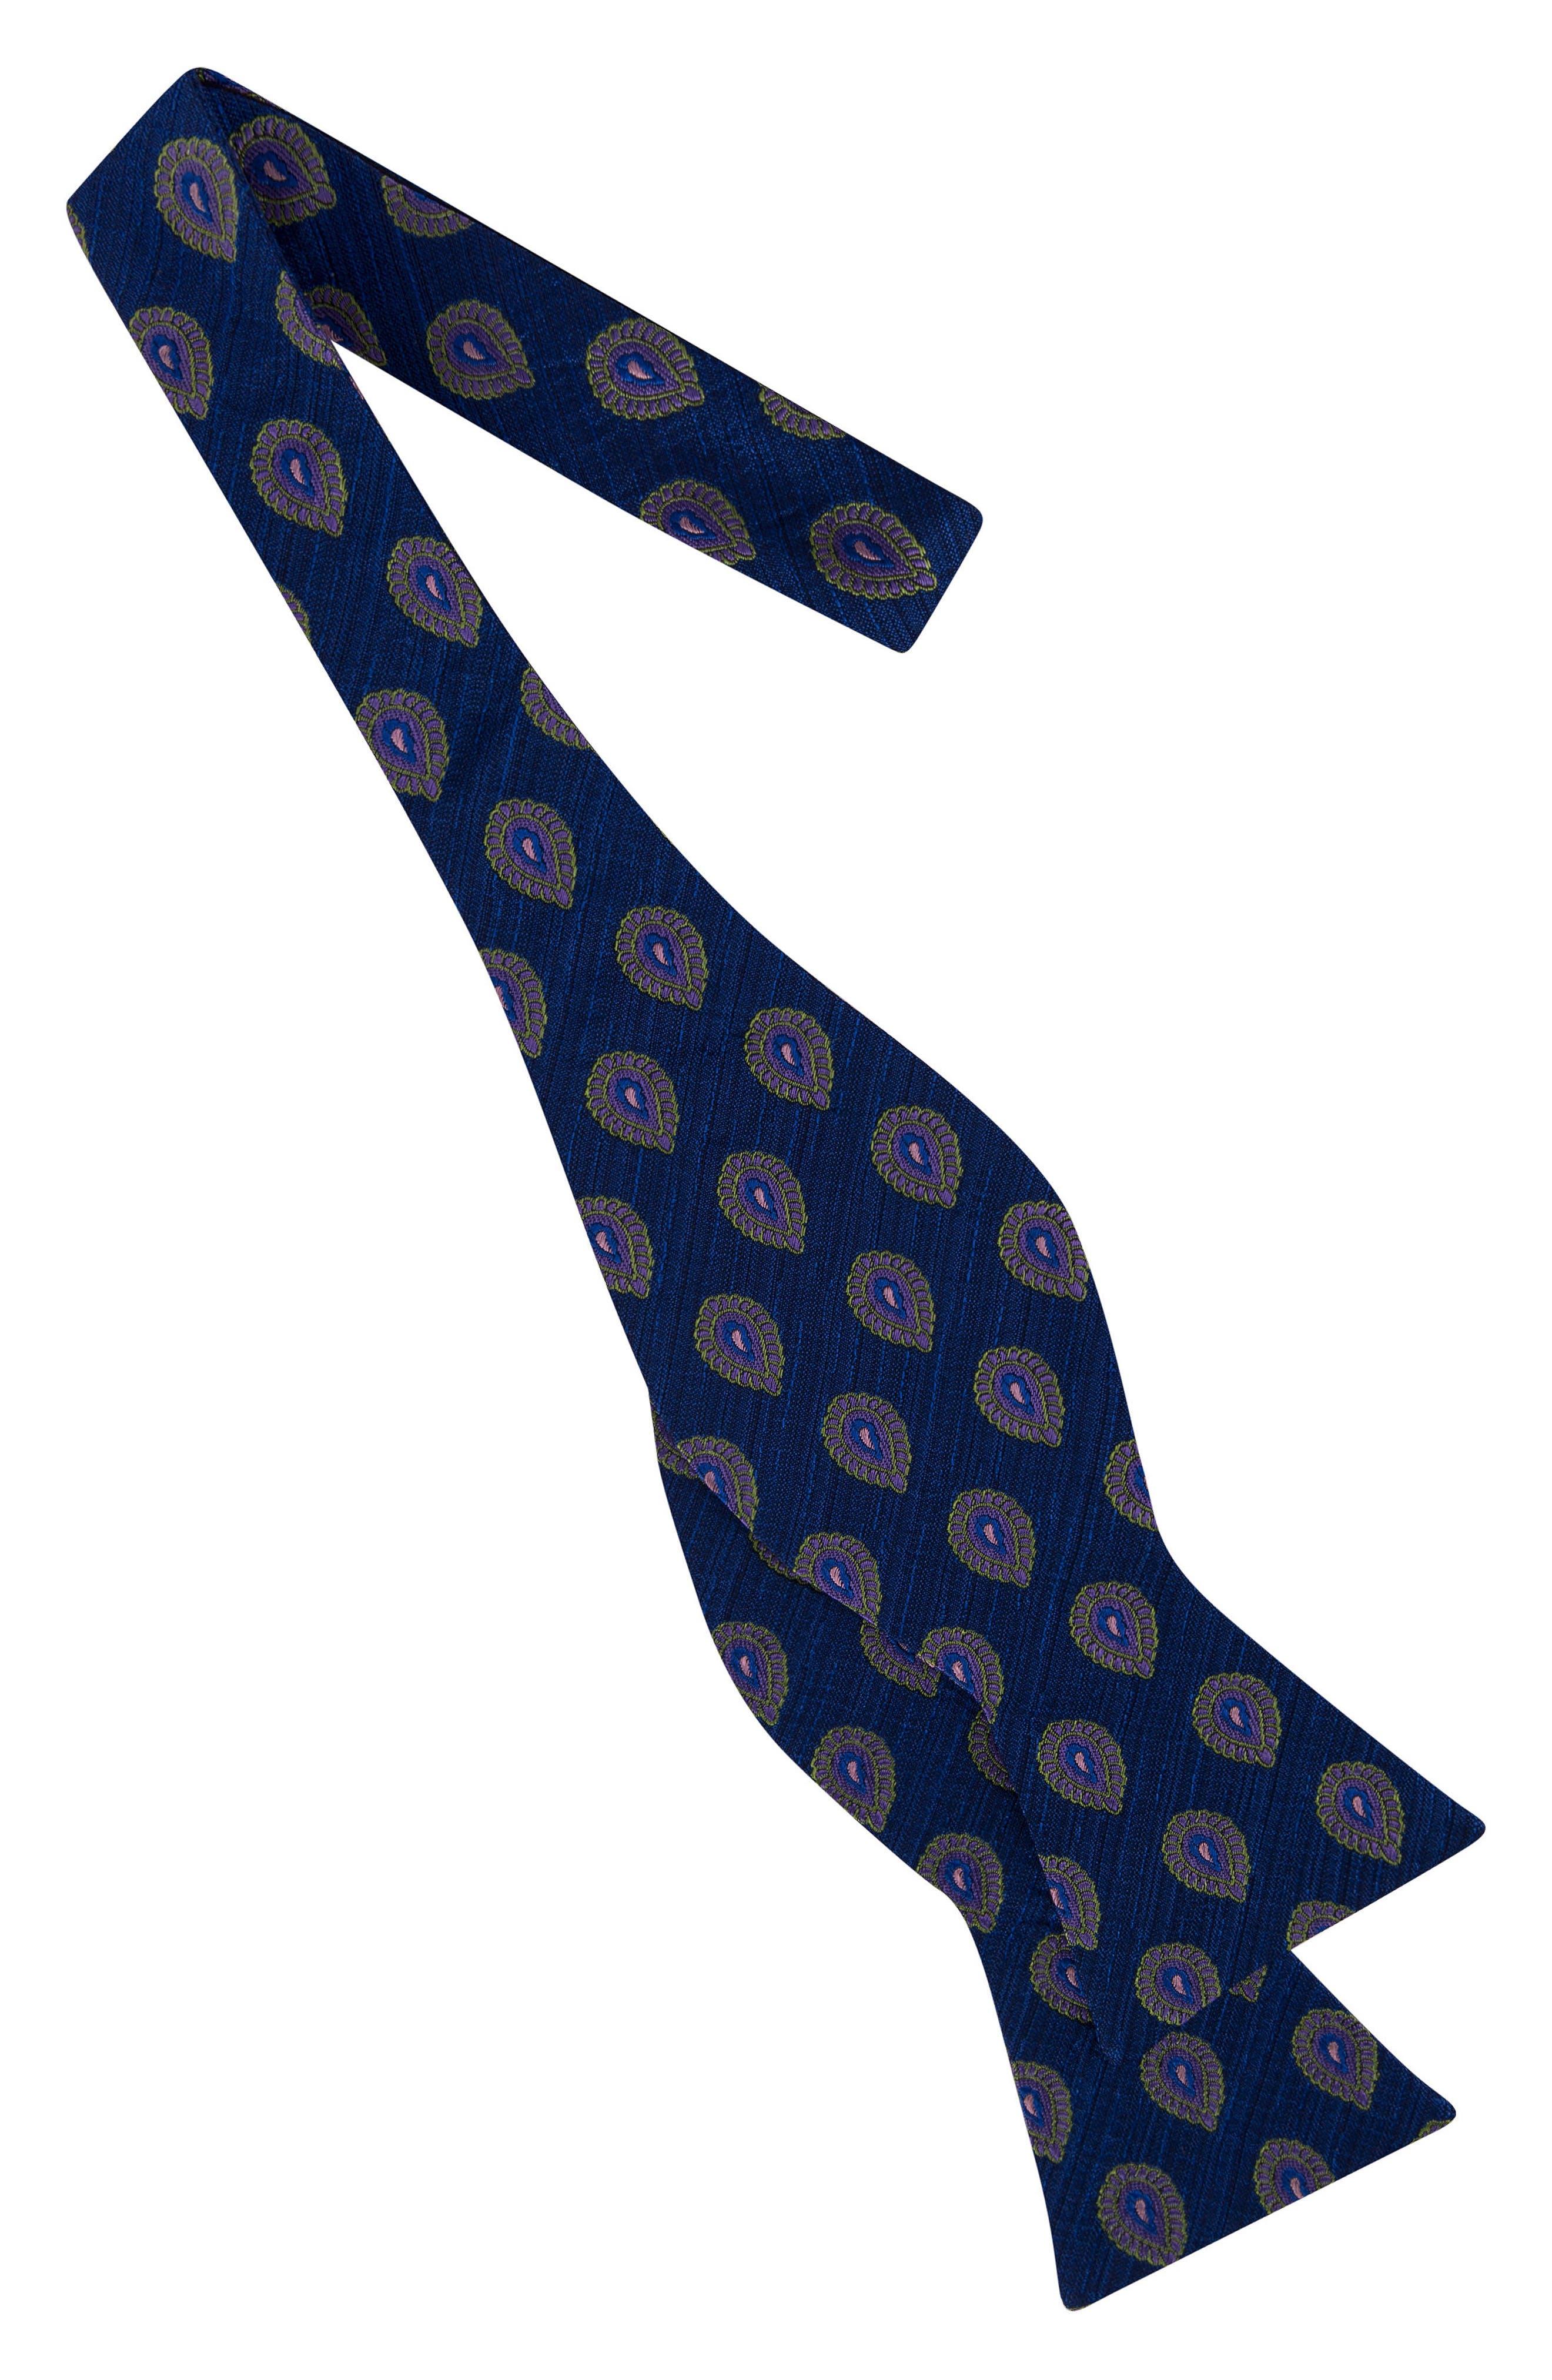 Elegant Medallion Silk Bow Tie,                             Alternate thumbnail 2, color,                             411